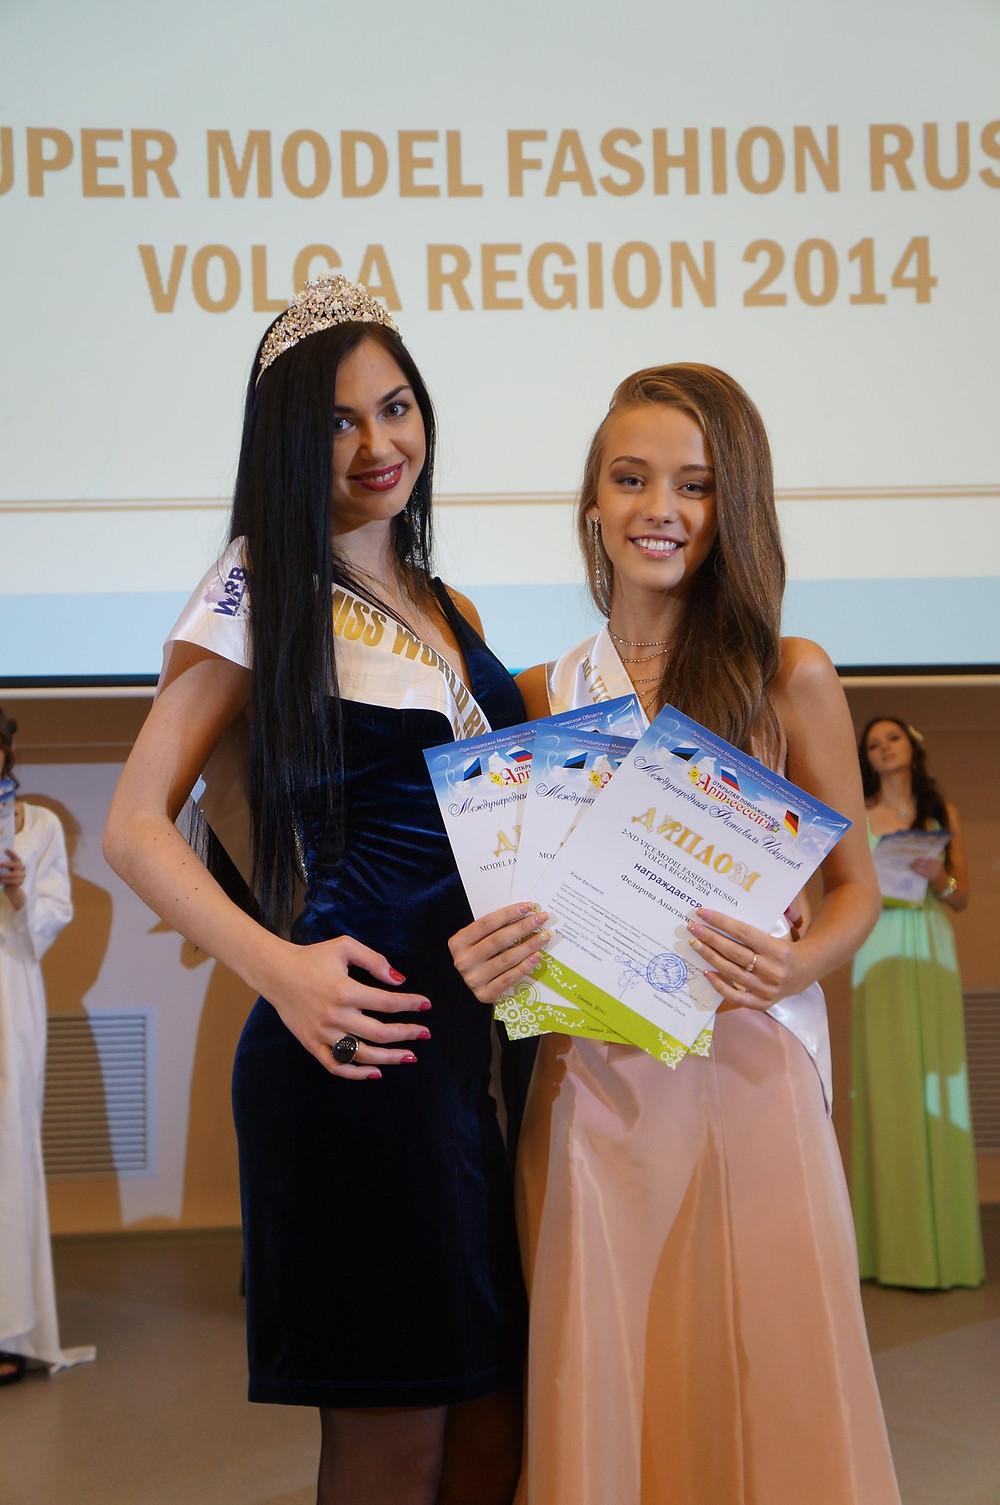 Анастасия Федорова - 2-nd Vice Model Fashion Russia Volga Region 2014